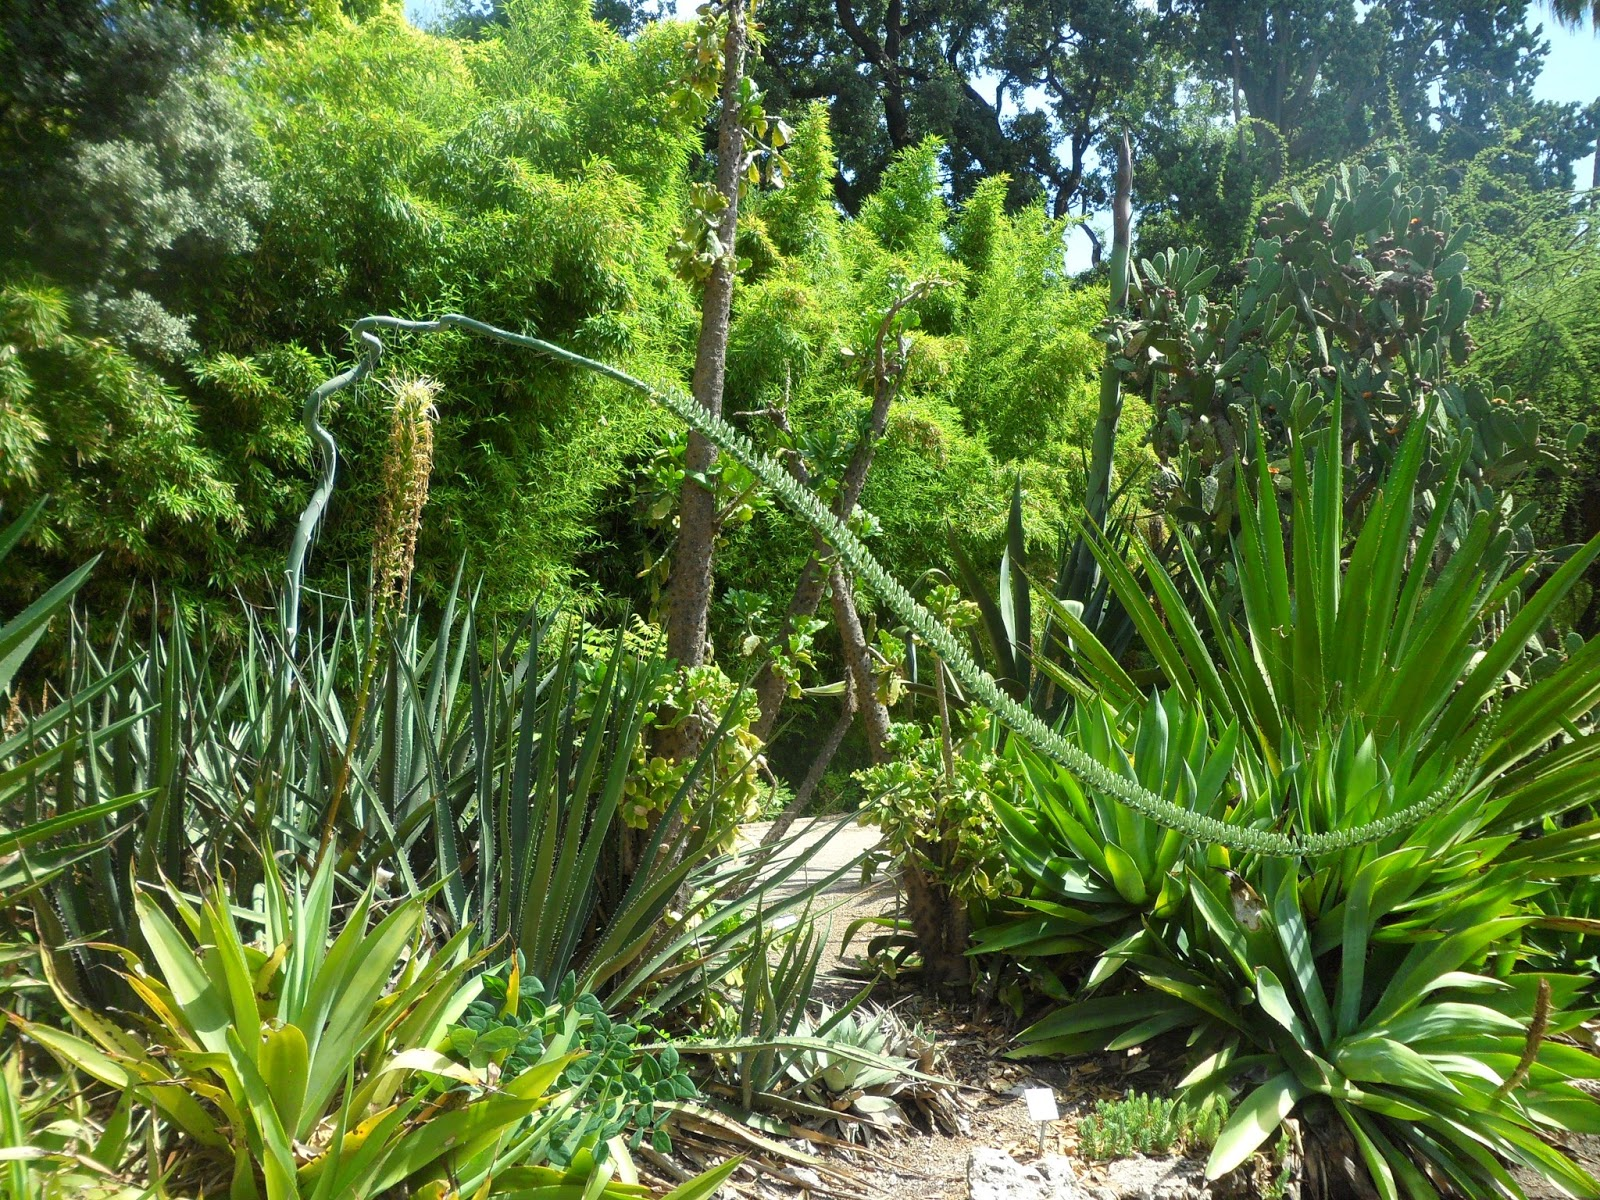 Visita al jard n bot nico de valencia - Jardin botanico valencia ...